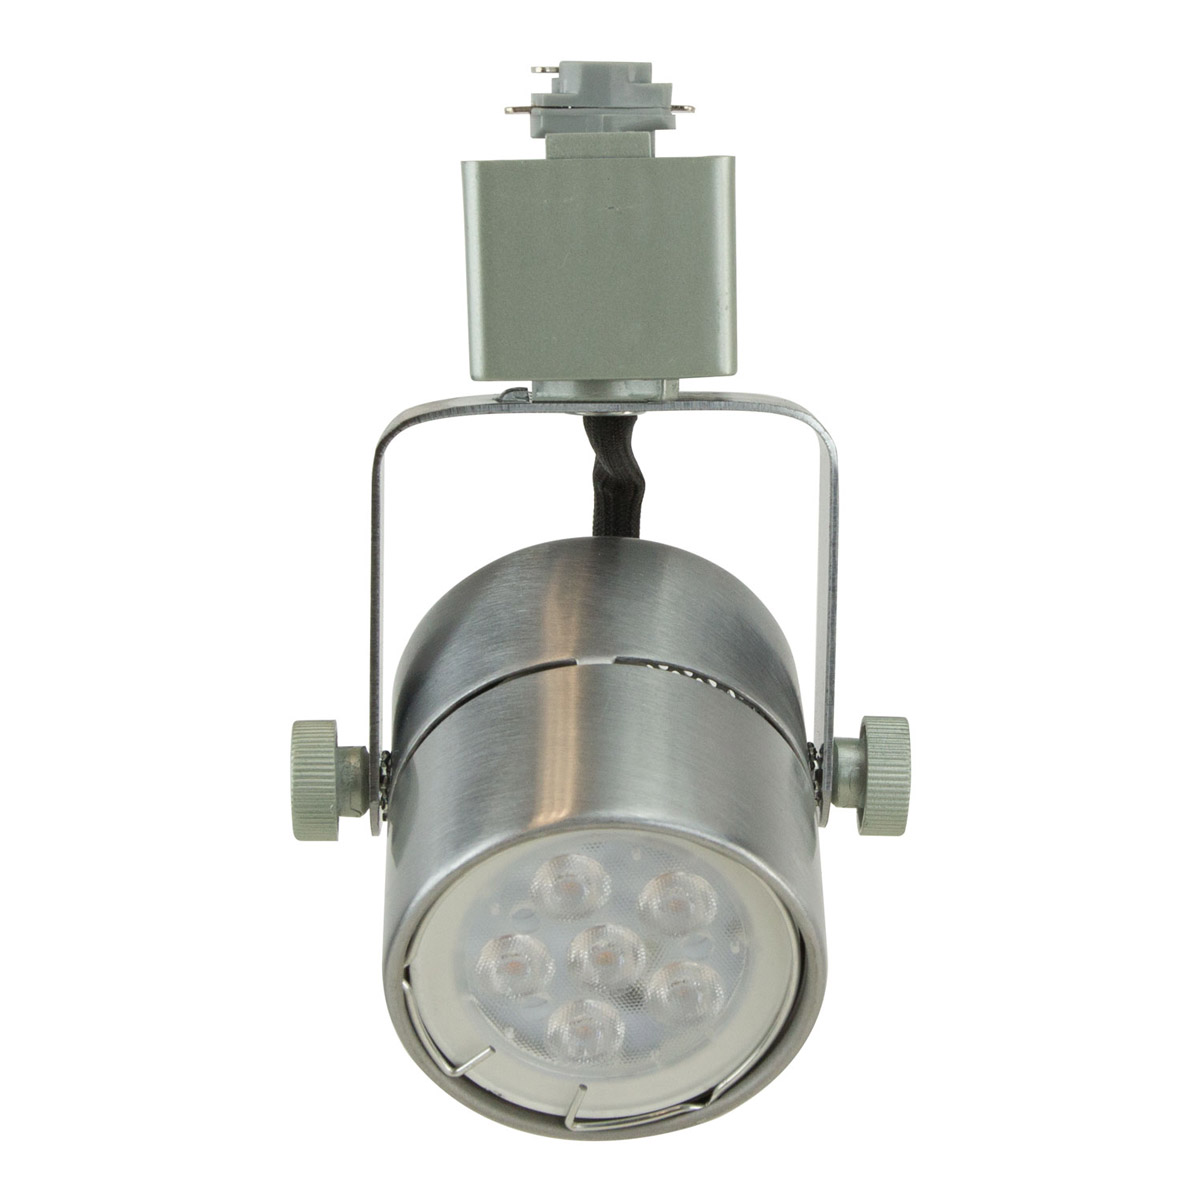 compatible halo track lighting